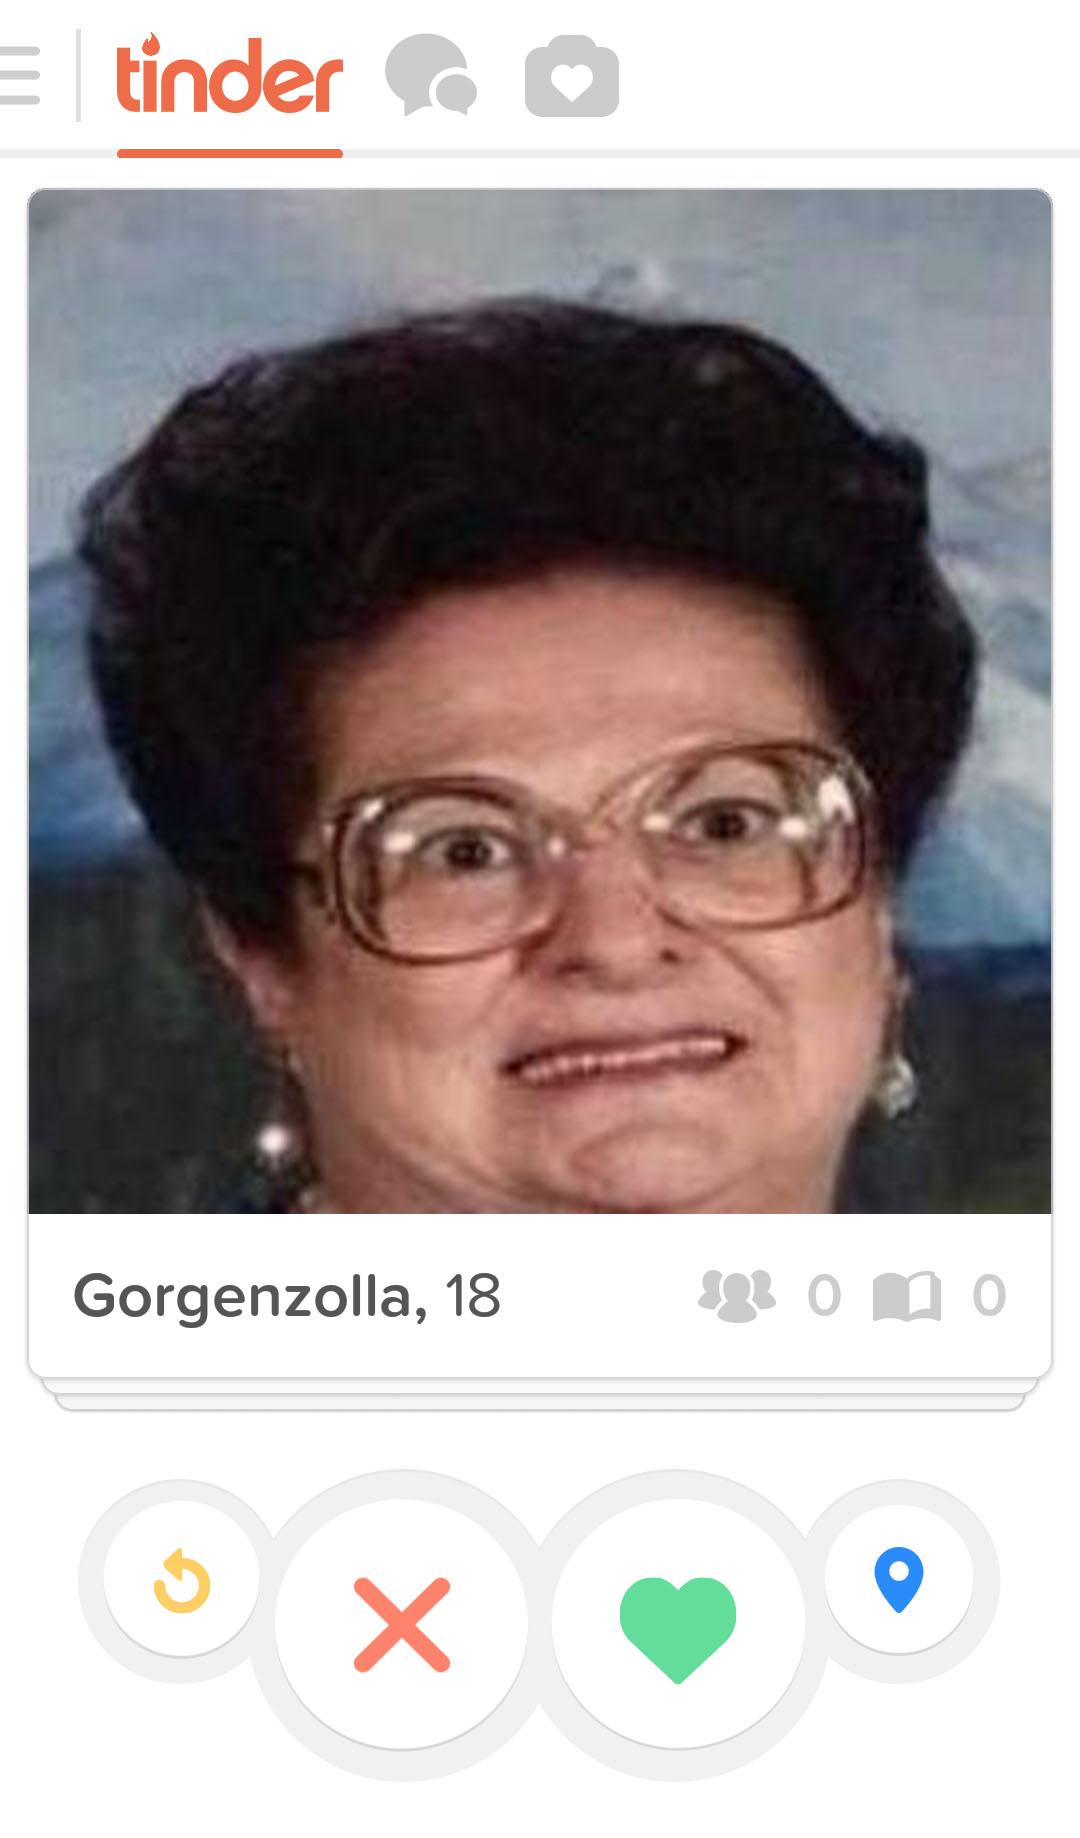 gorgenzolla